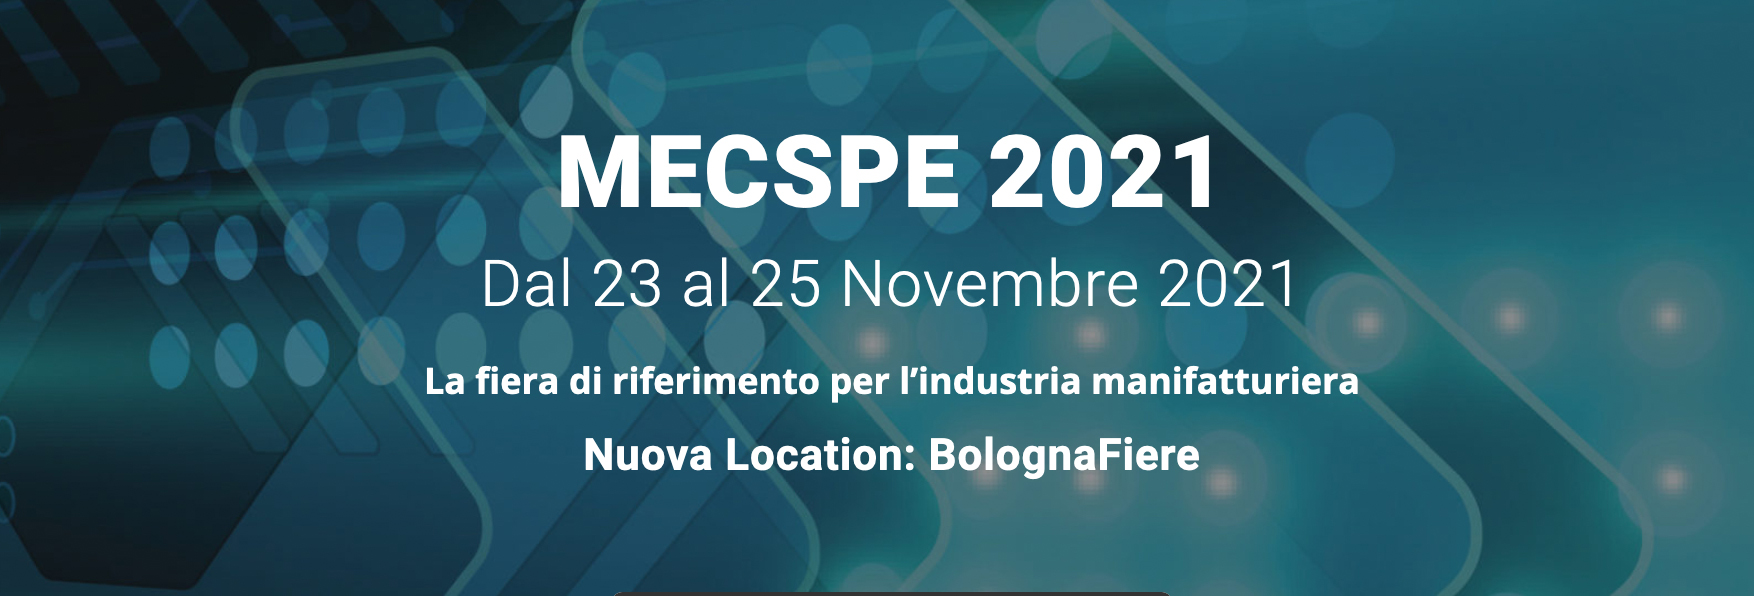 MECSPE 2021 nuova location